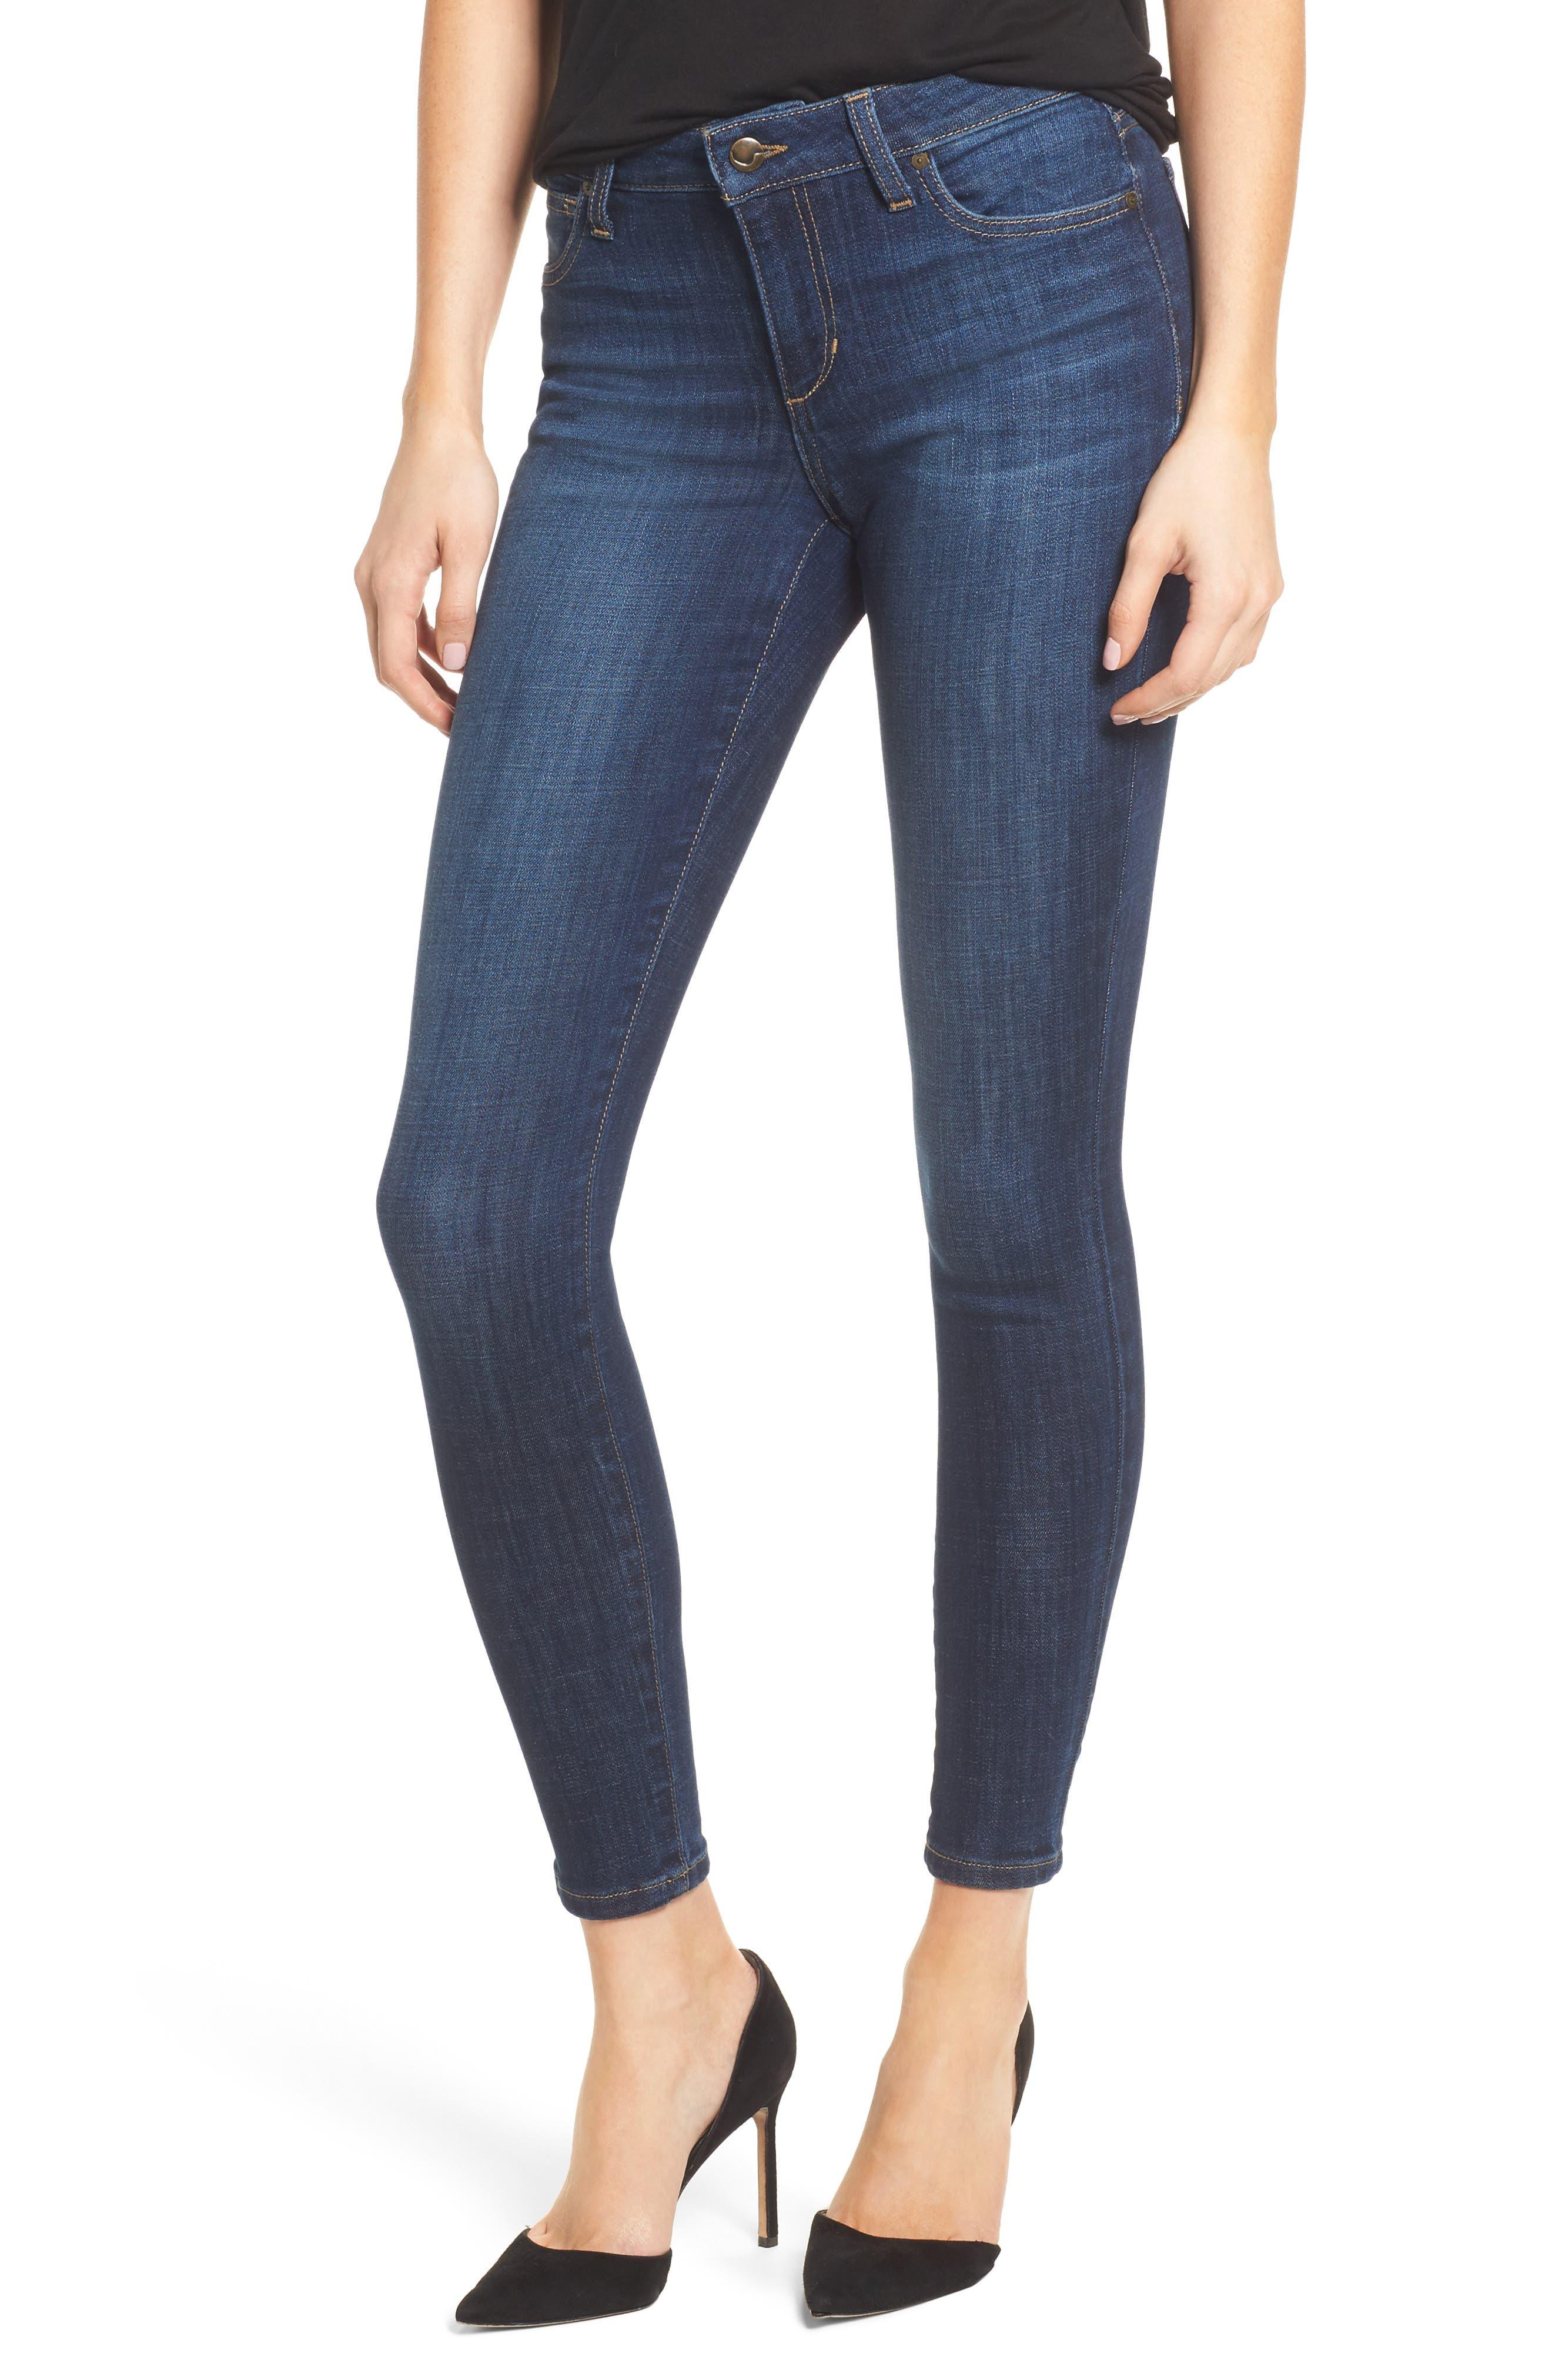 Alternate Image 1 Selected - Joe's Flawless - Icon Skinny Ankle Jeans (Fernanda)